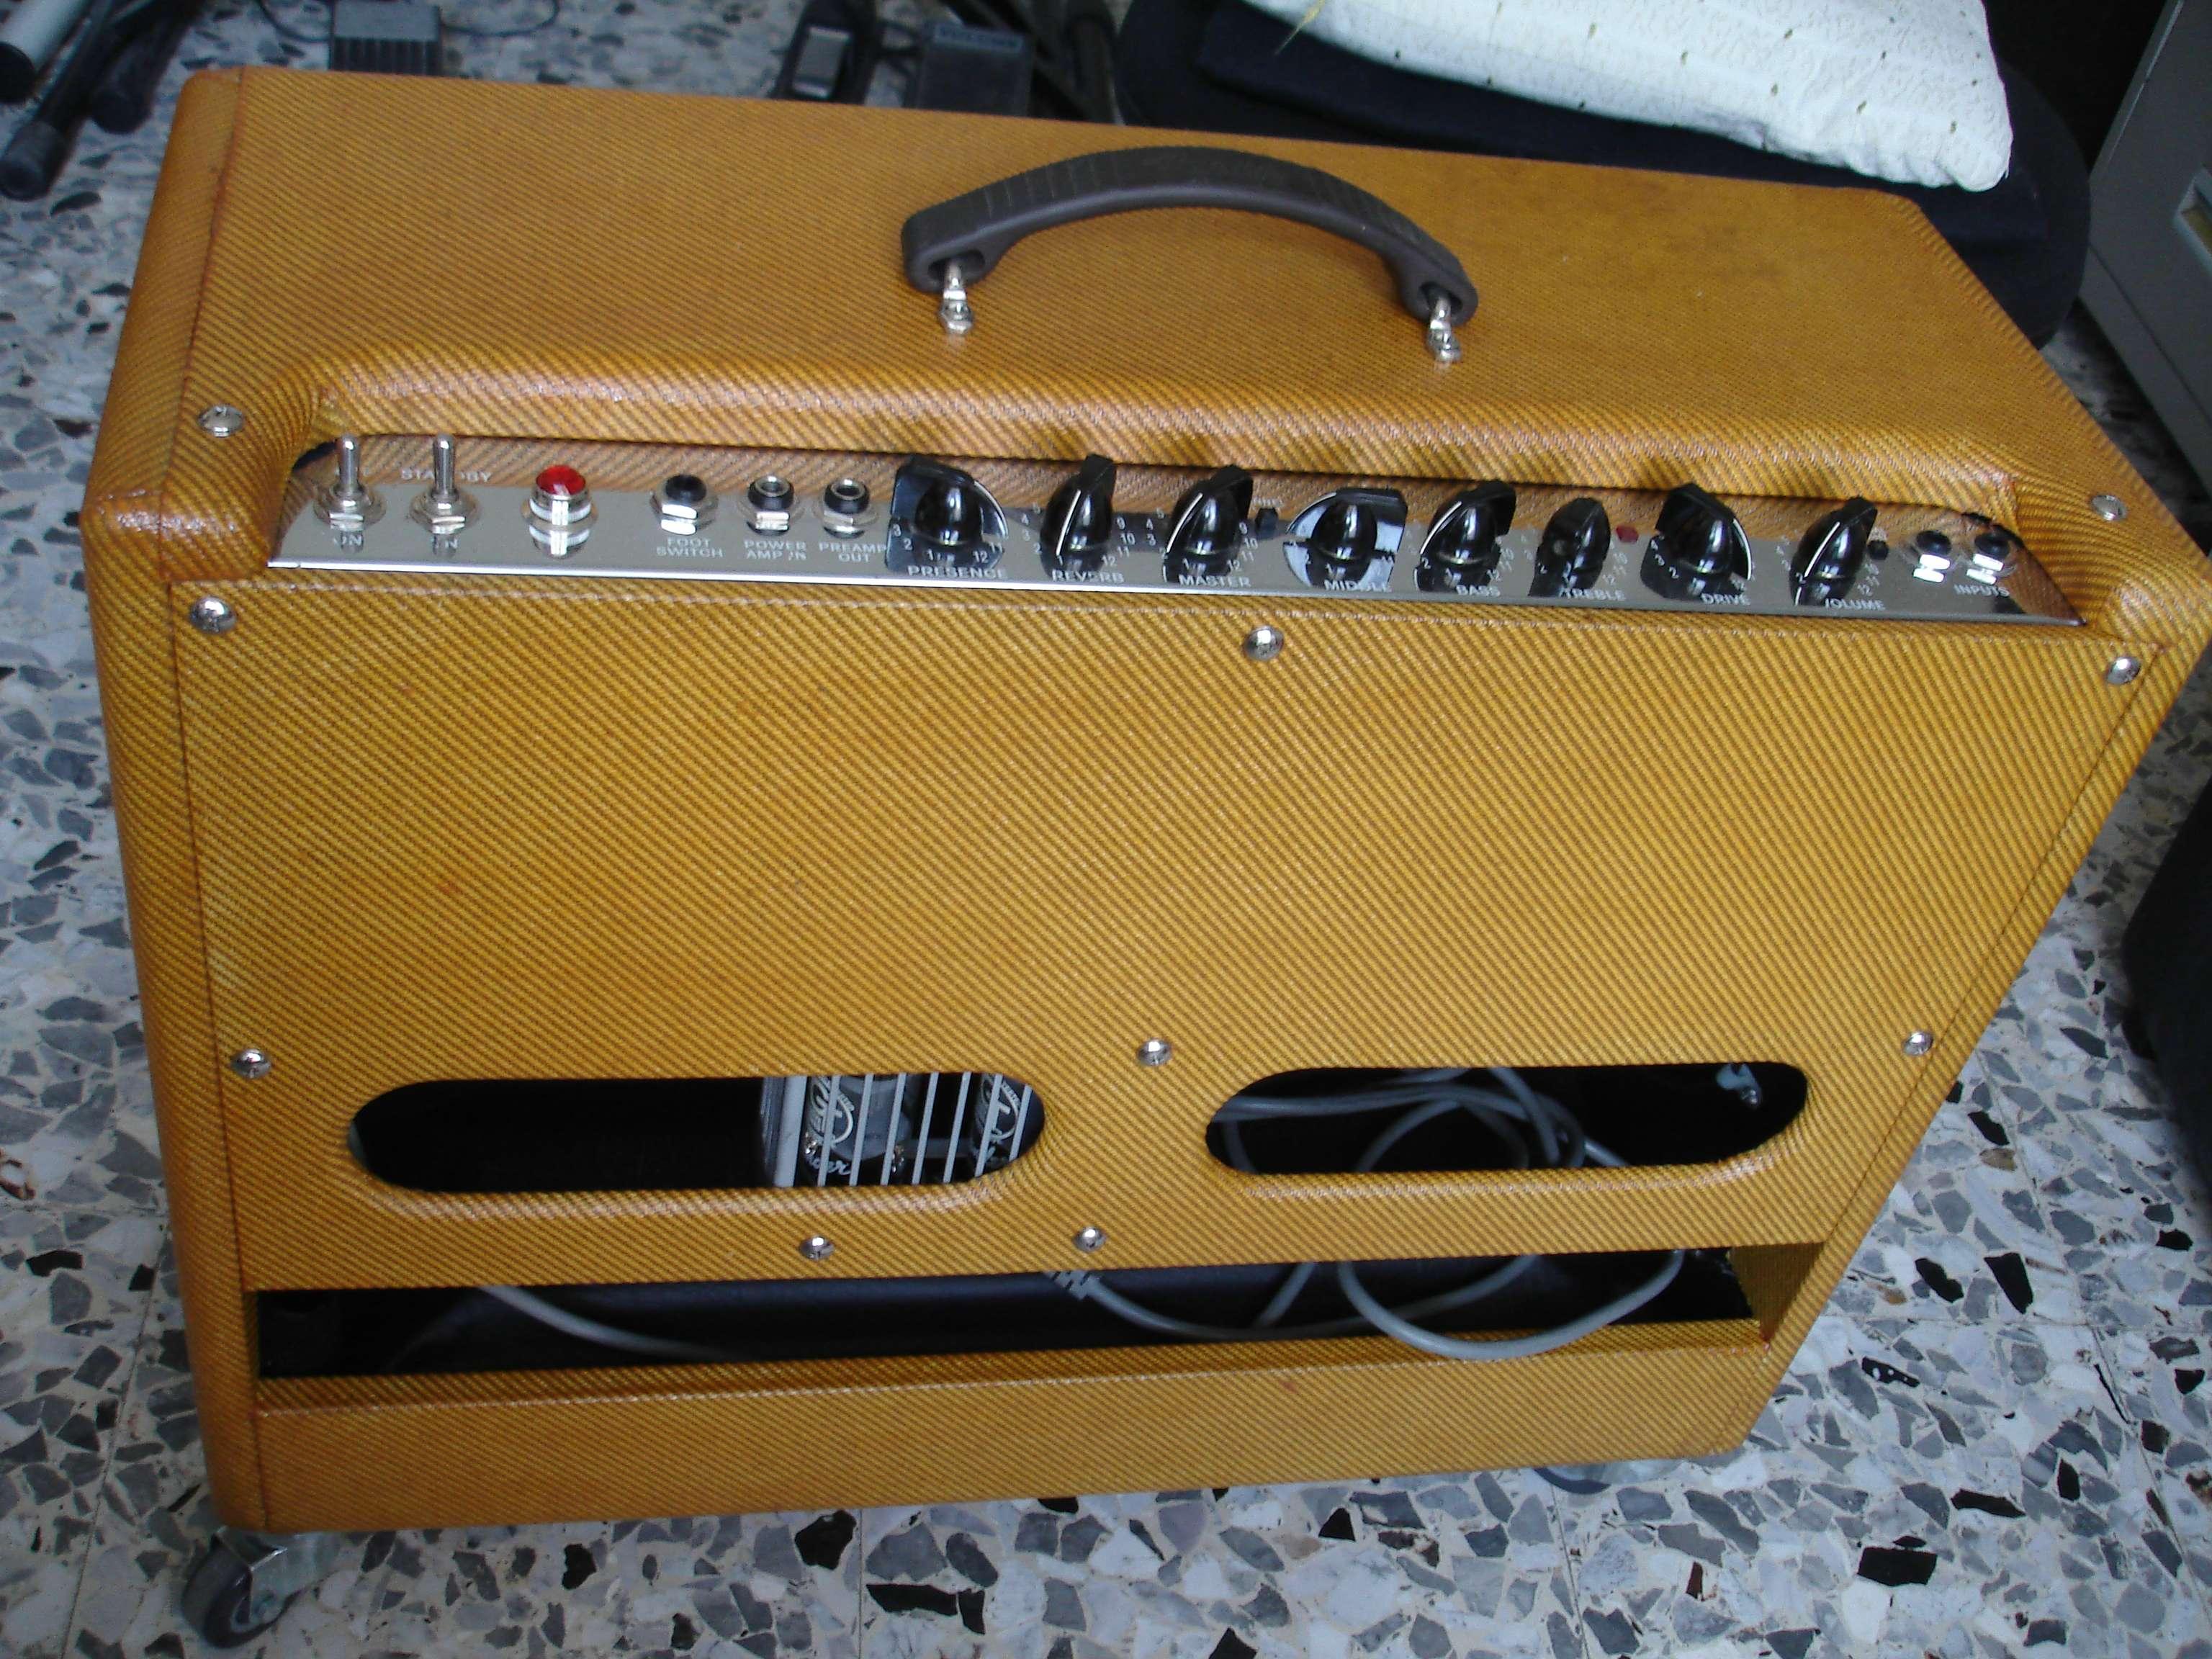 Fender Blues Deluxe Reissue Image 488764 Audiofanzine border=